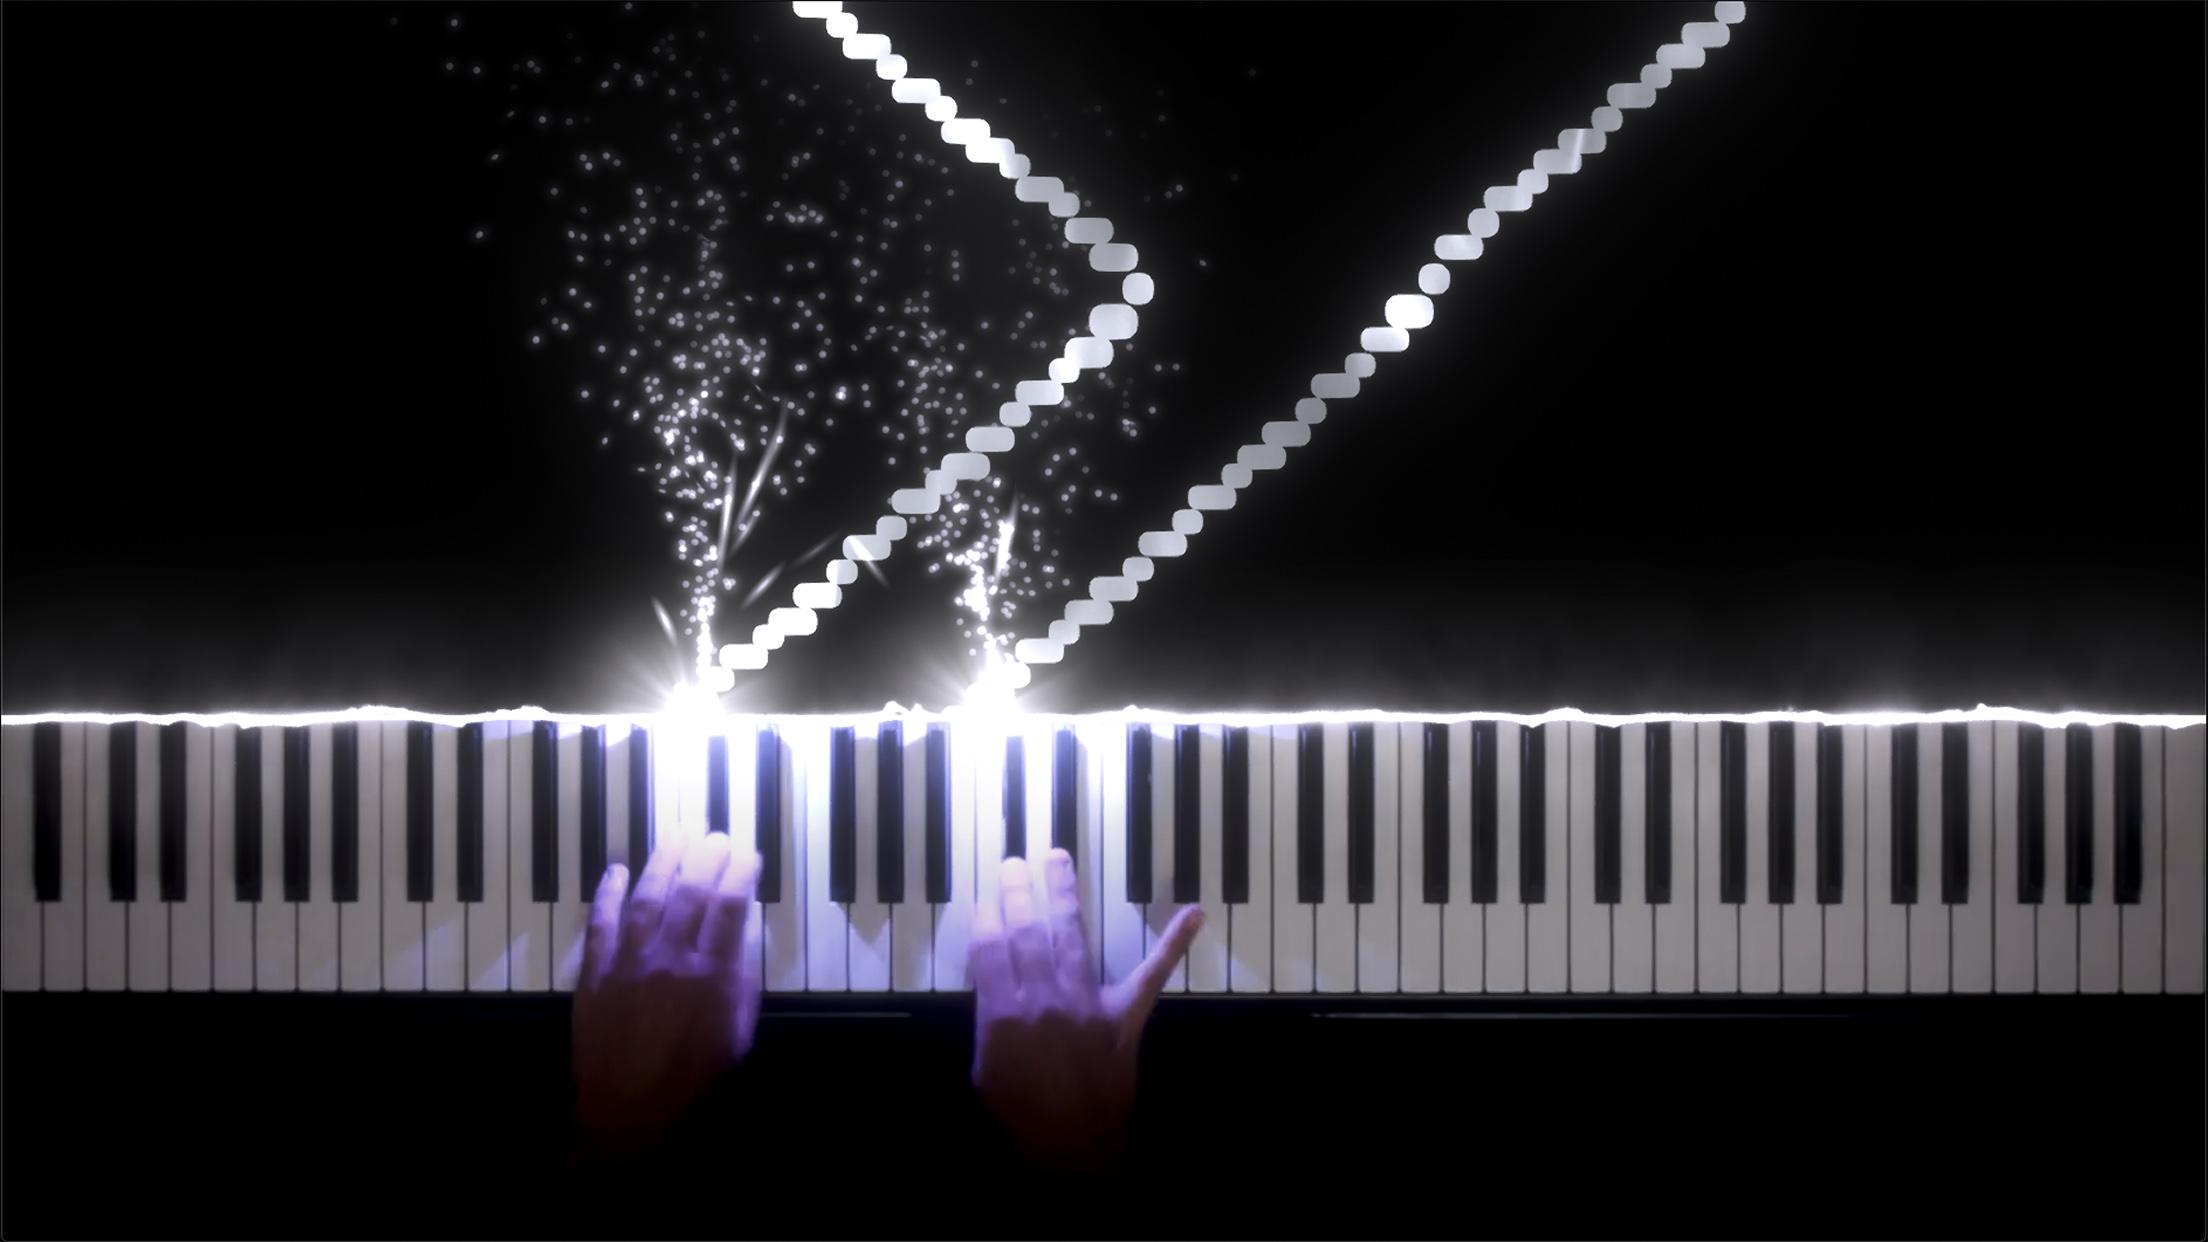 SeeMusic Video Creation